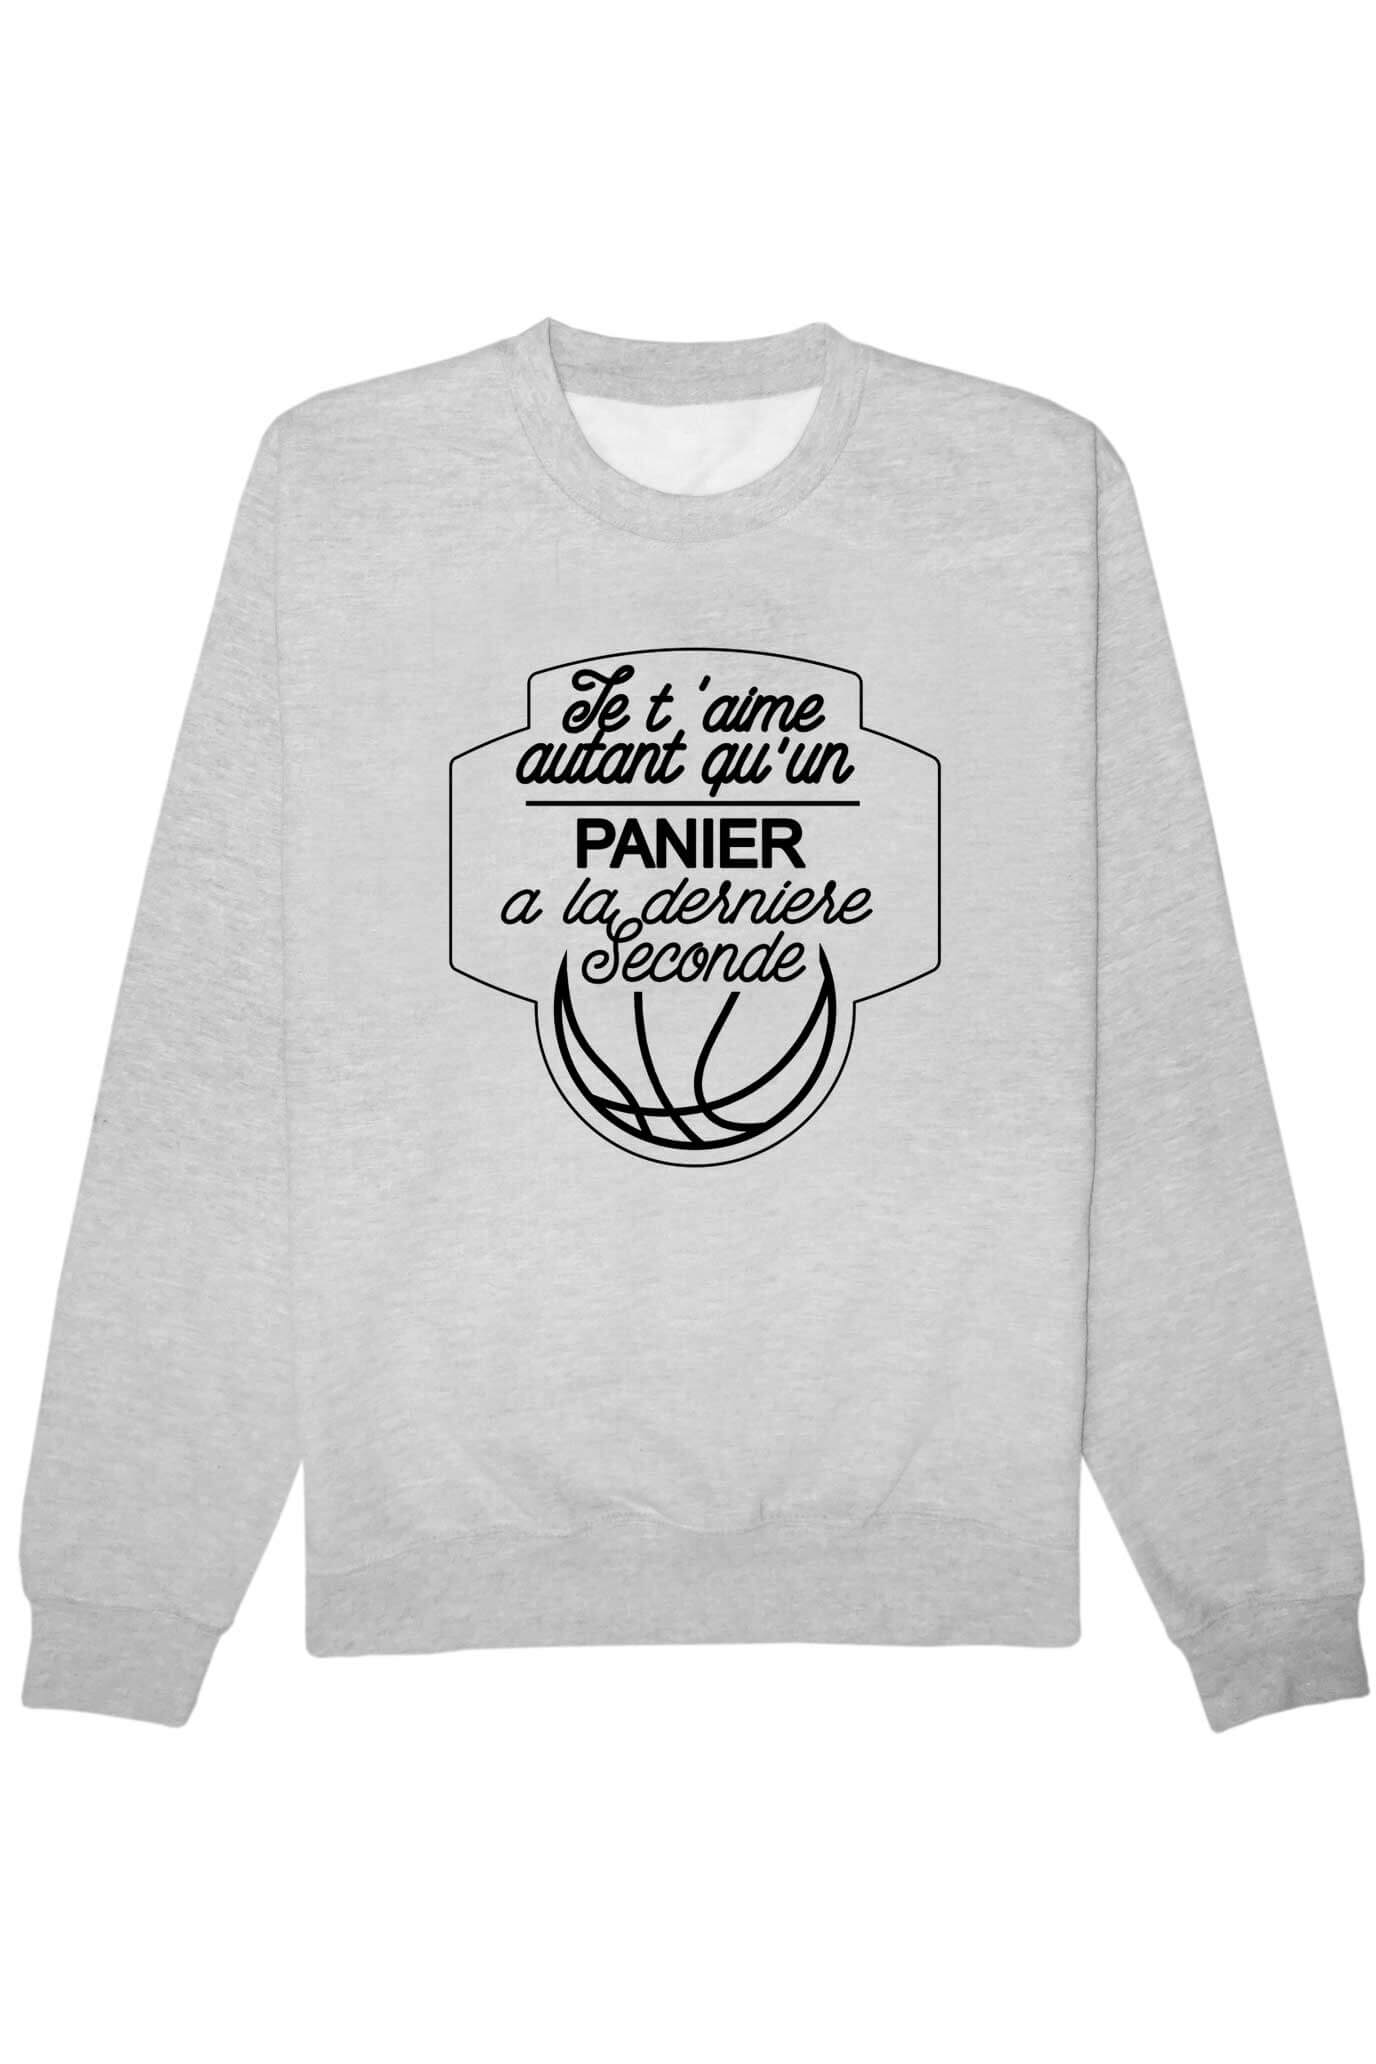 Assez Je t'aime autant vs basket (blanc) Sweat – Tshirtdef SY93